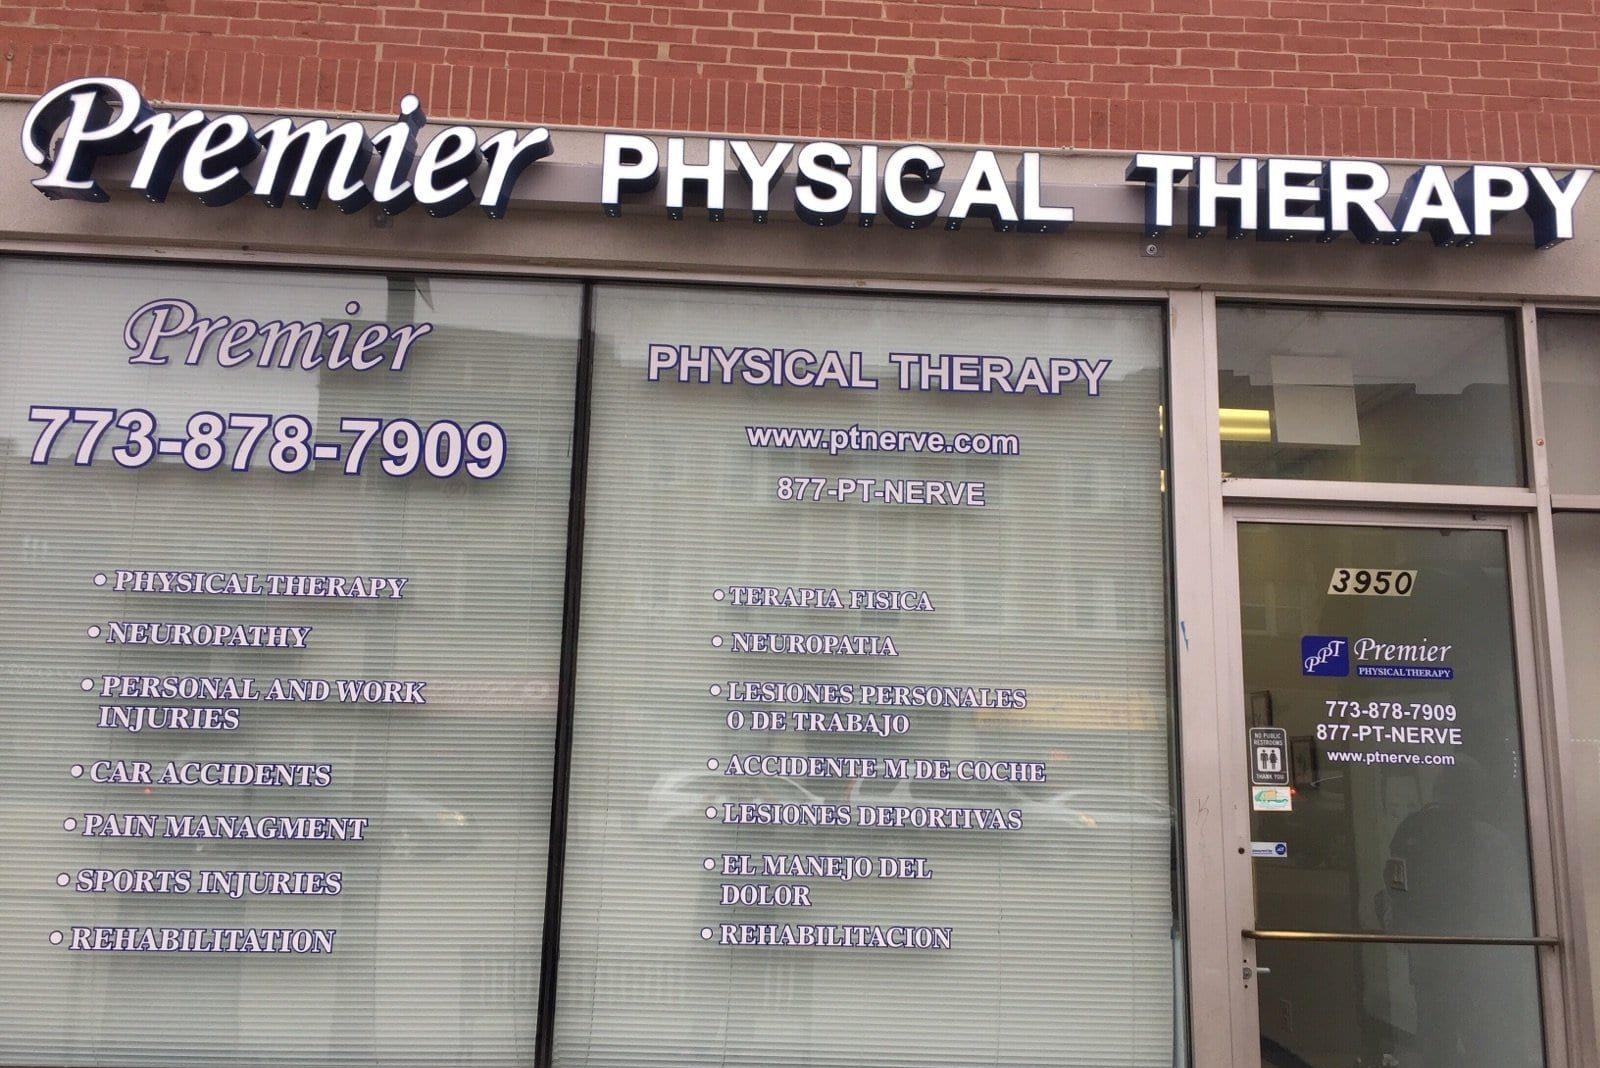 Premier-Physical-Therapy-Ashland-Location-e1593365534403